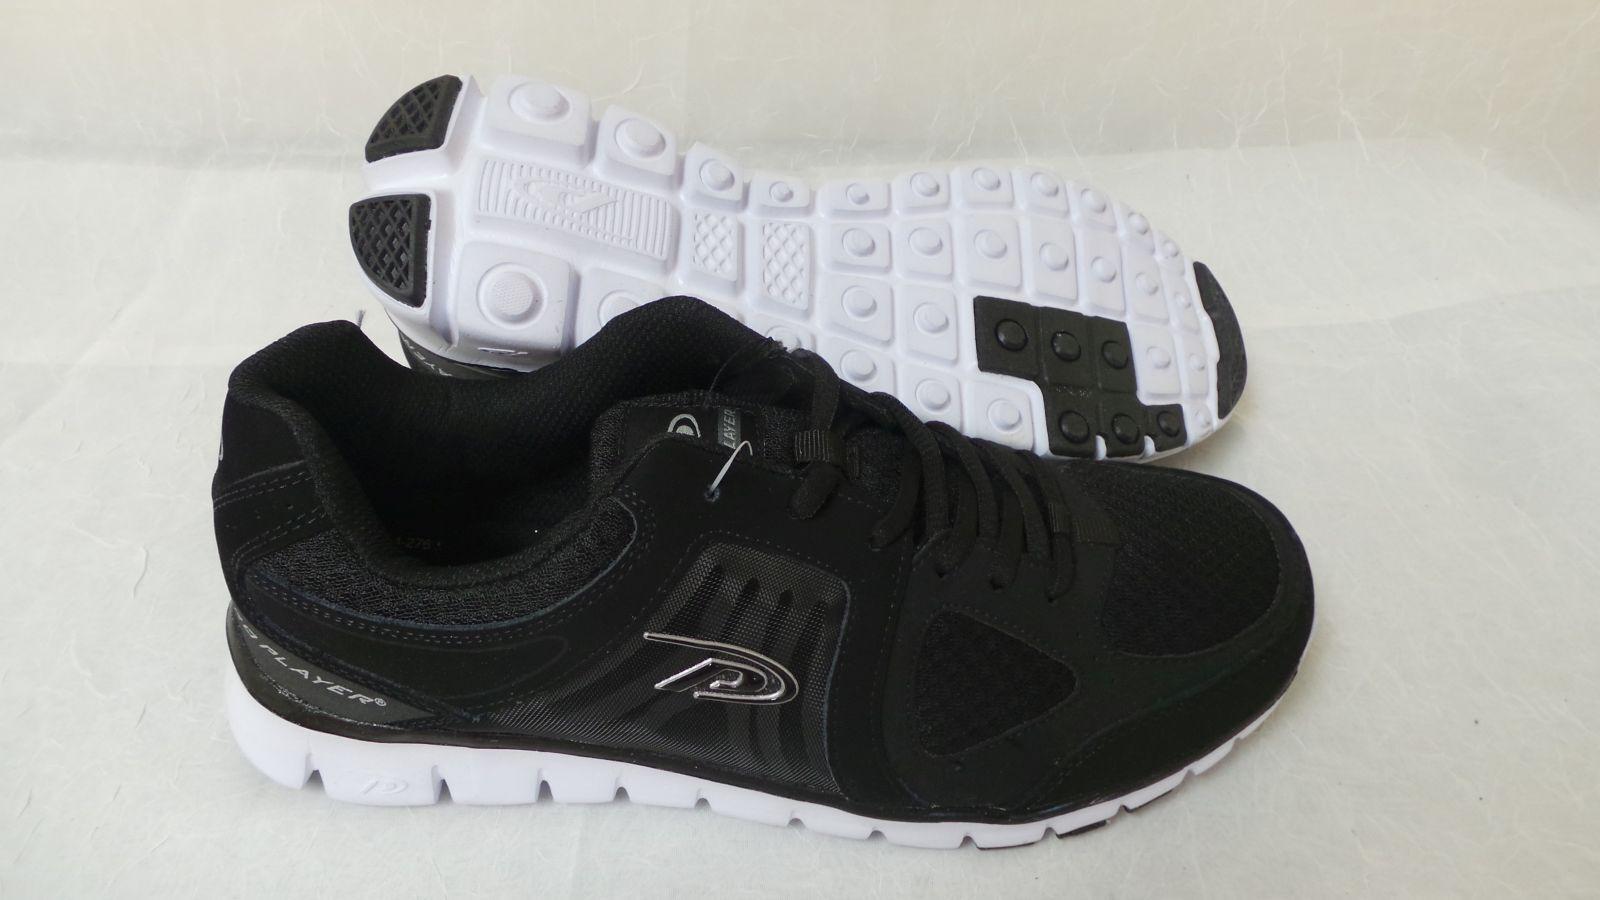 New Proplayer Mens Torch Athletic Shoes Size 95 Black V5 Tshirt Women Blue Navy M La 0ec949